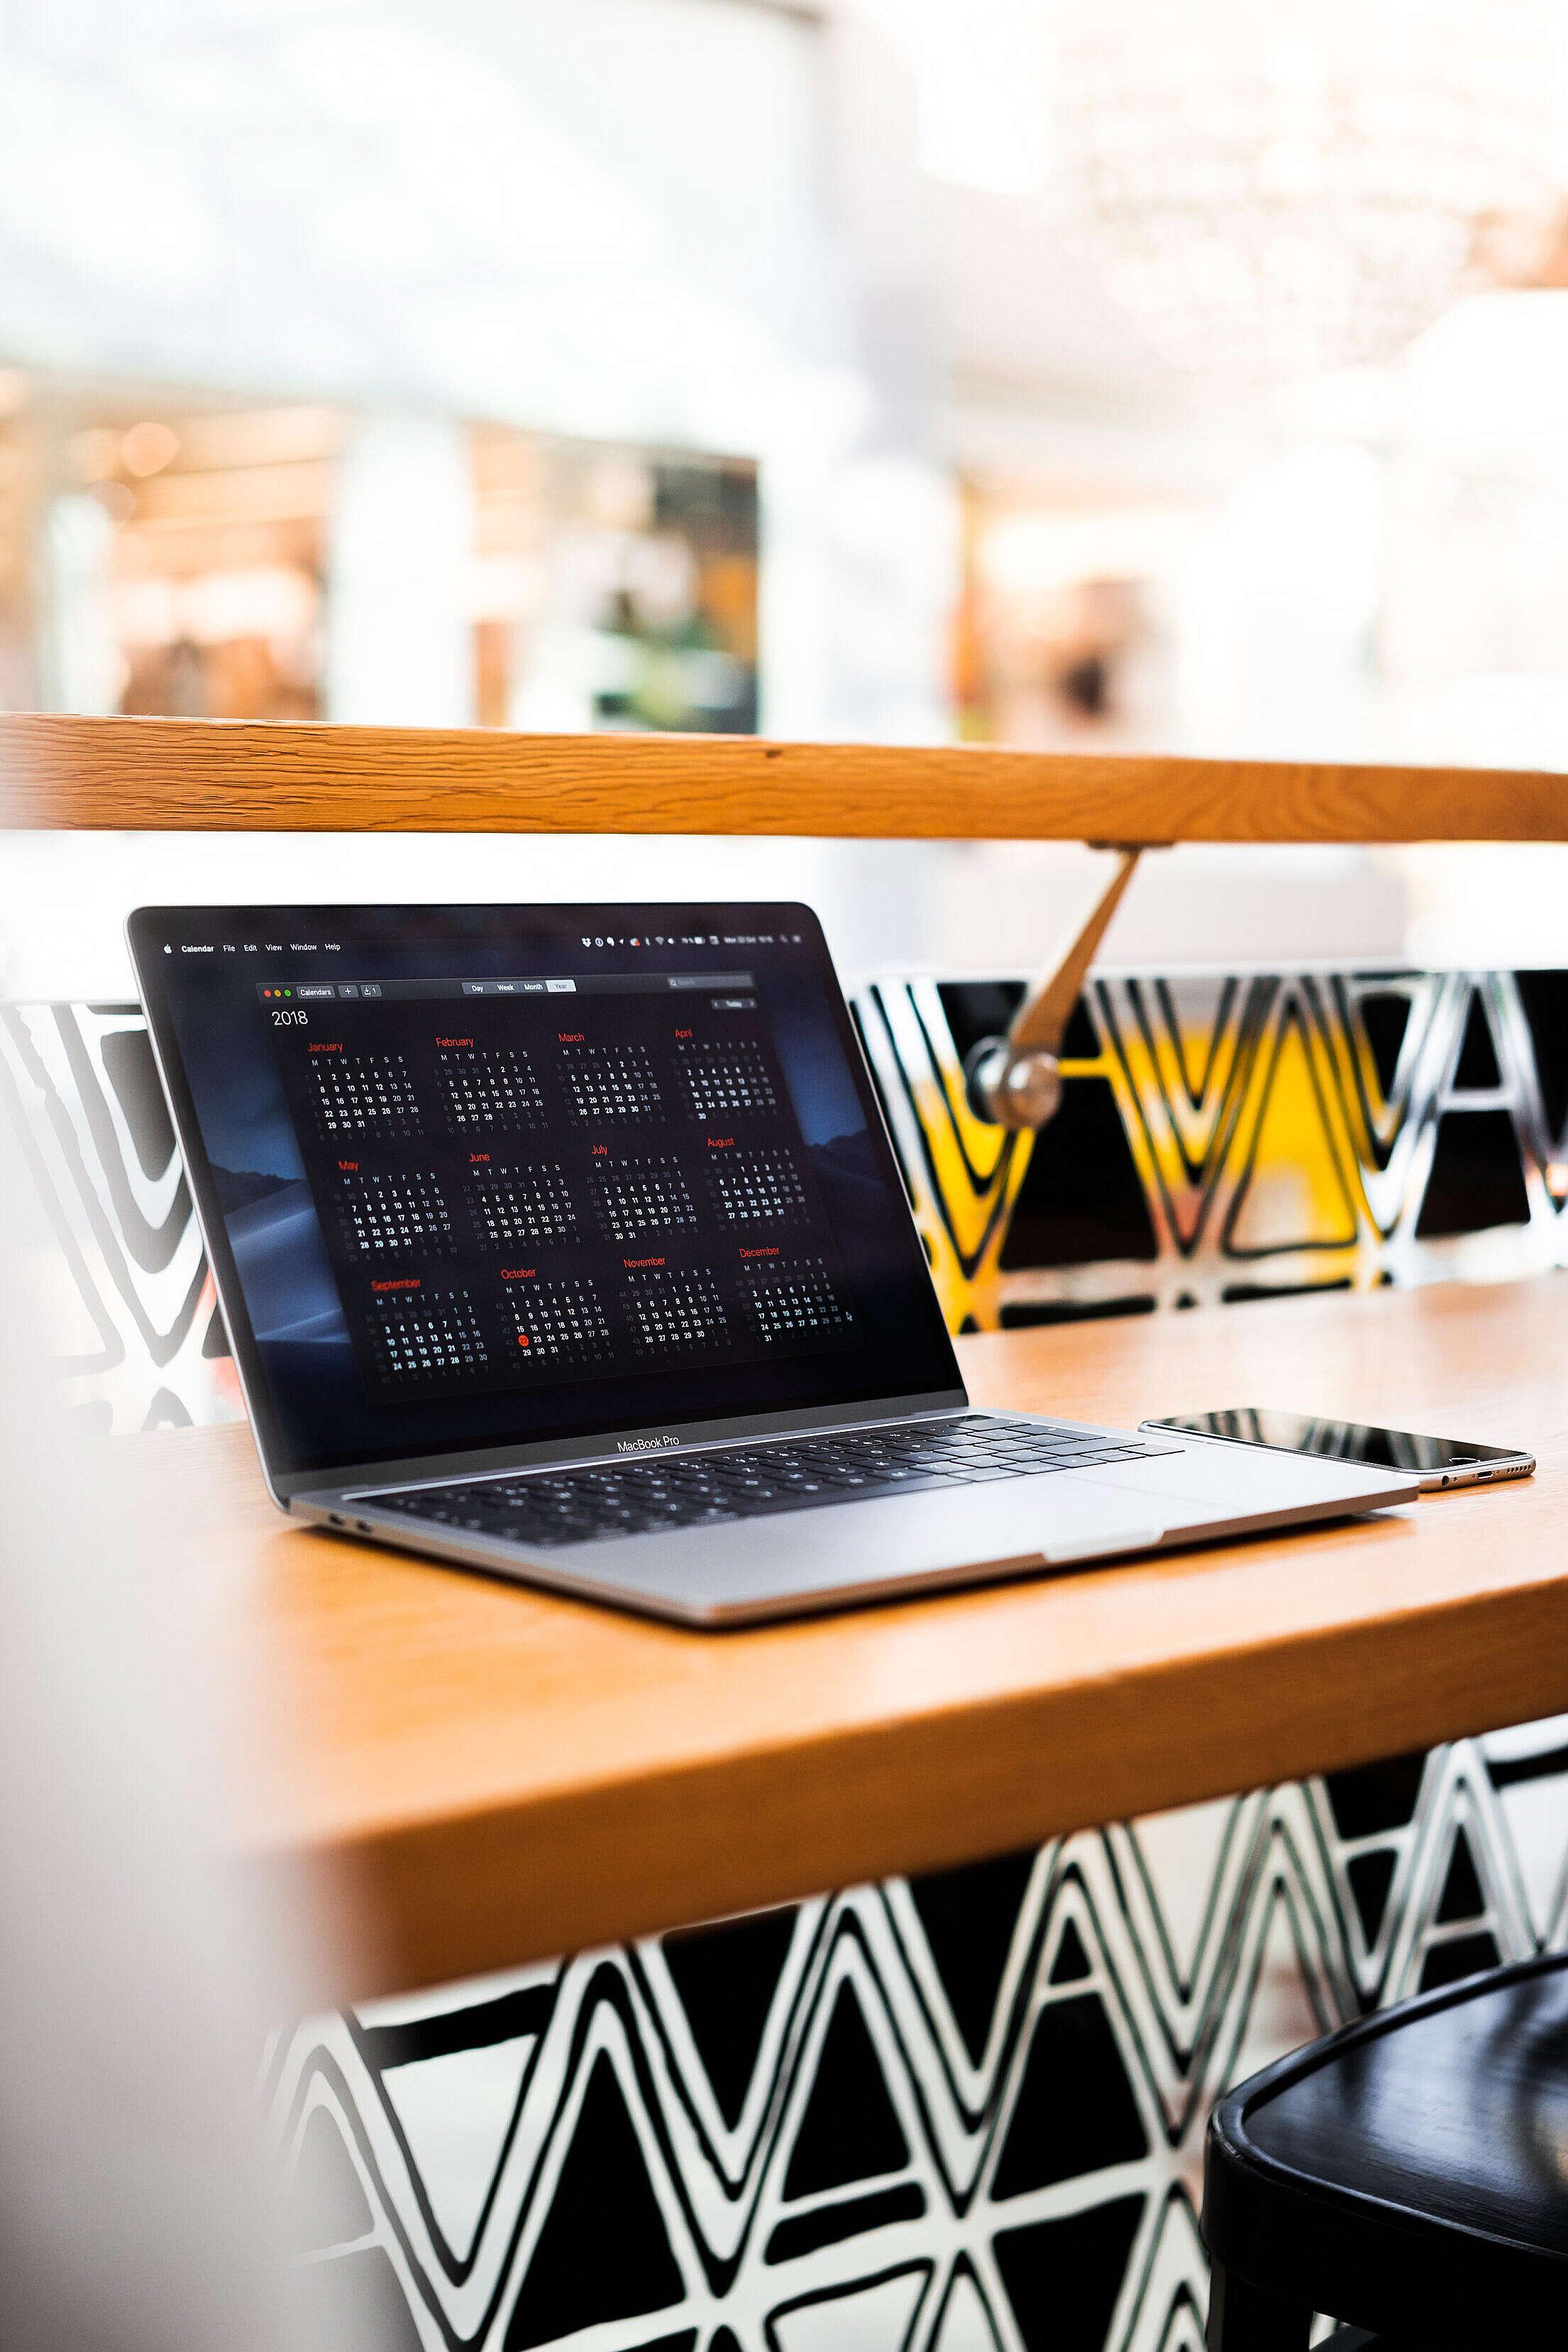 Modern Laptop in Café Vertical Free Stock Photo